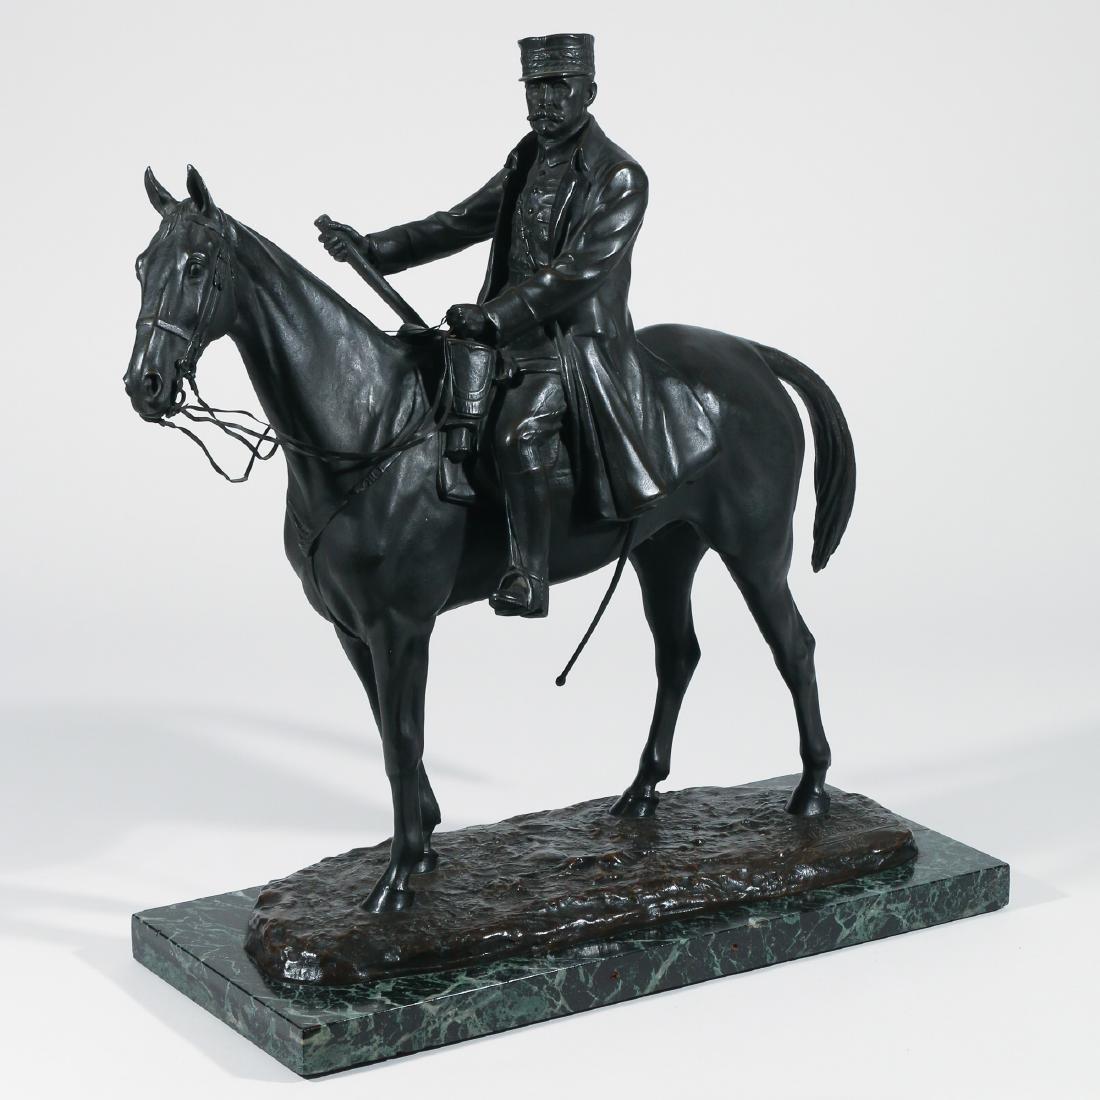 GEORGE MALISARD (French, 1877-1942)